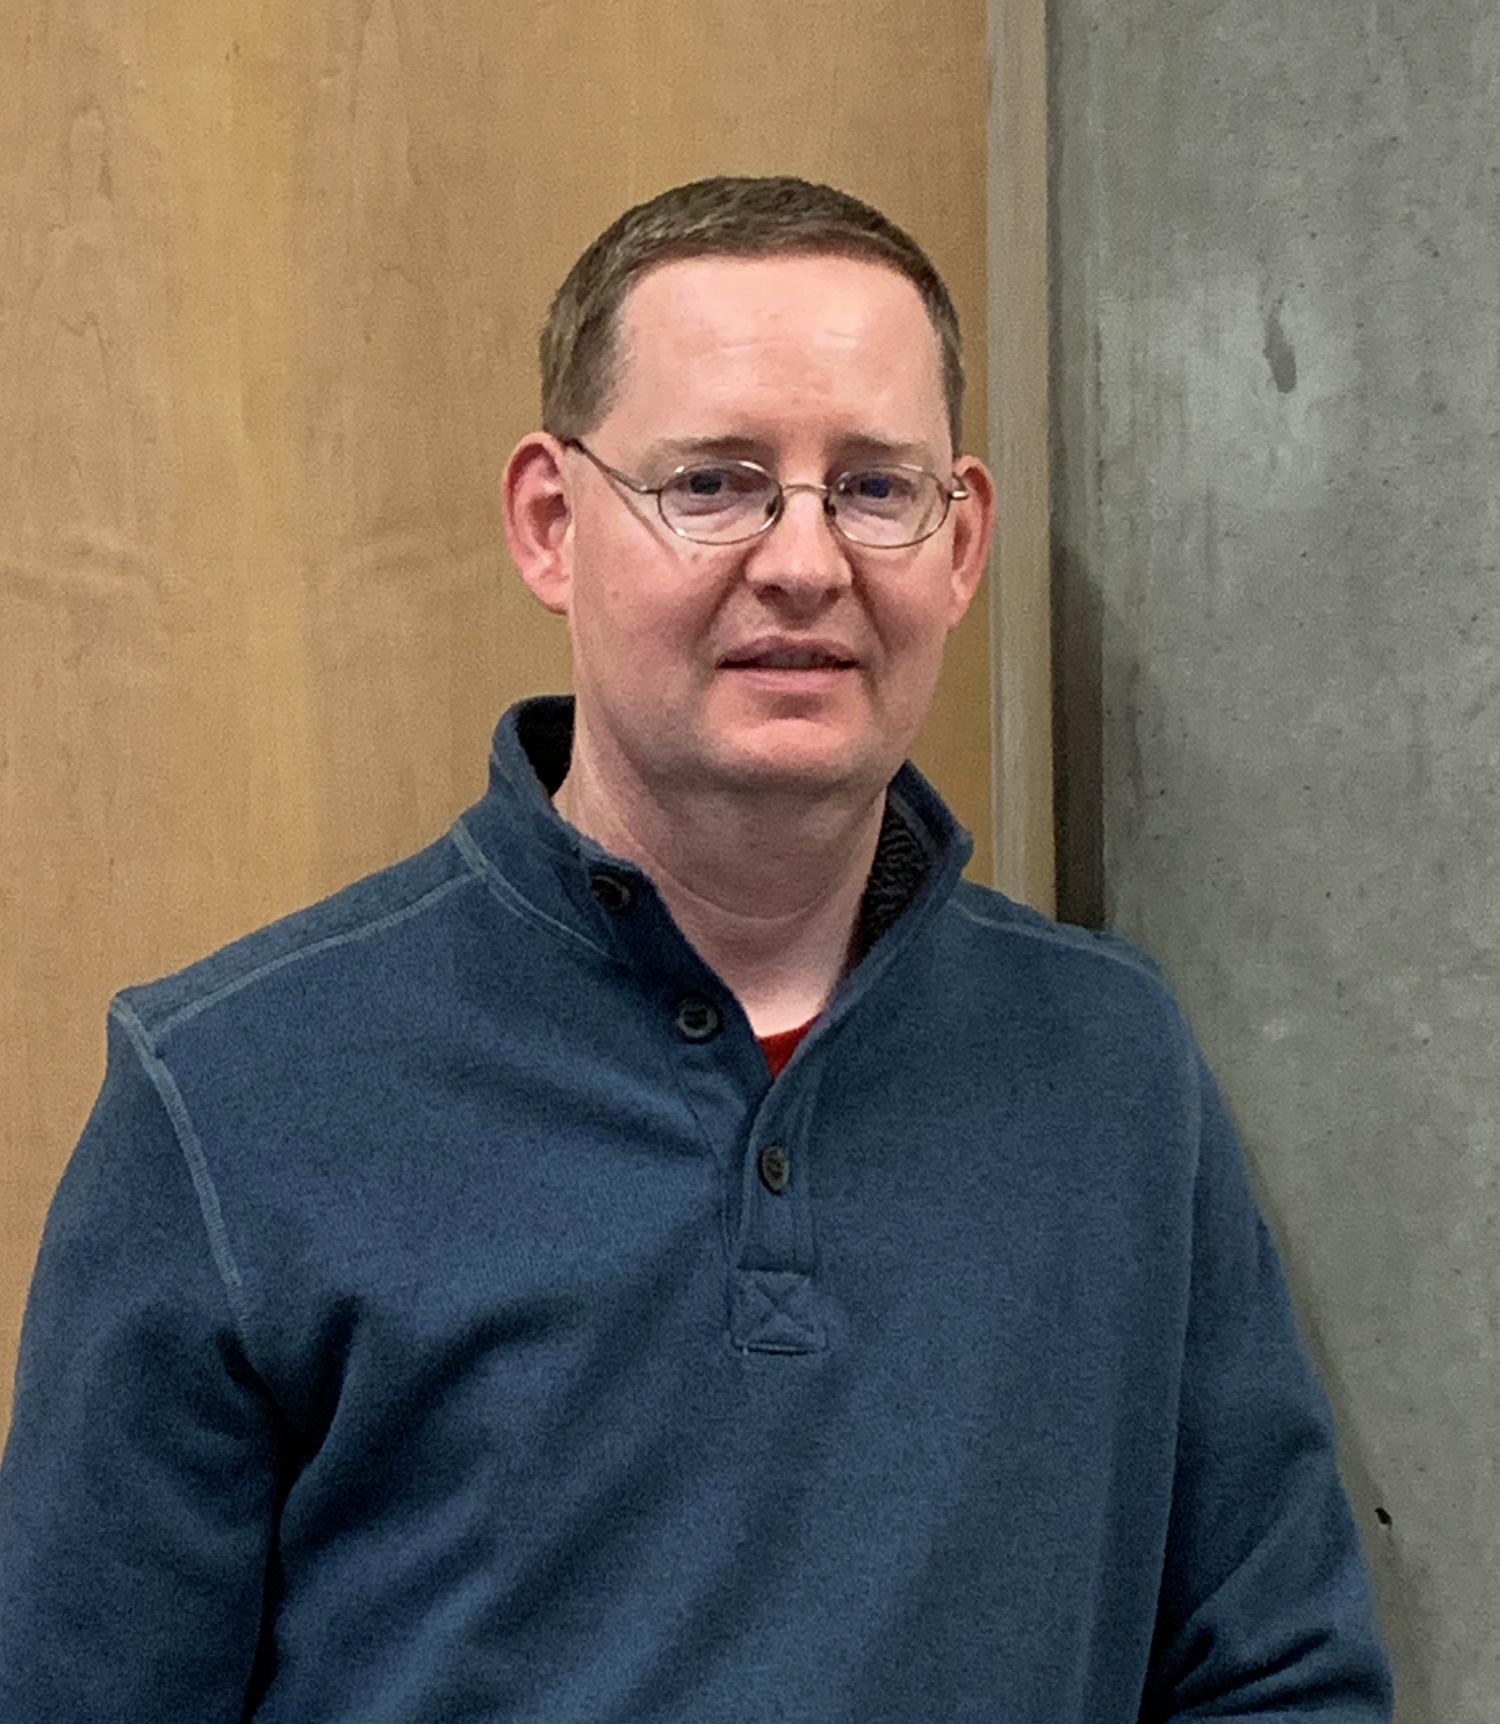 Michael Grimm Undergraduate Pathway Instructor at OSU